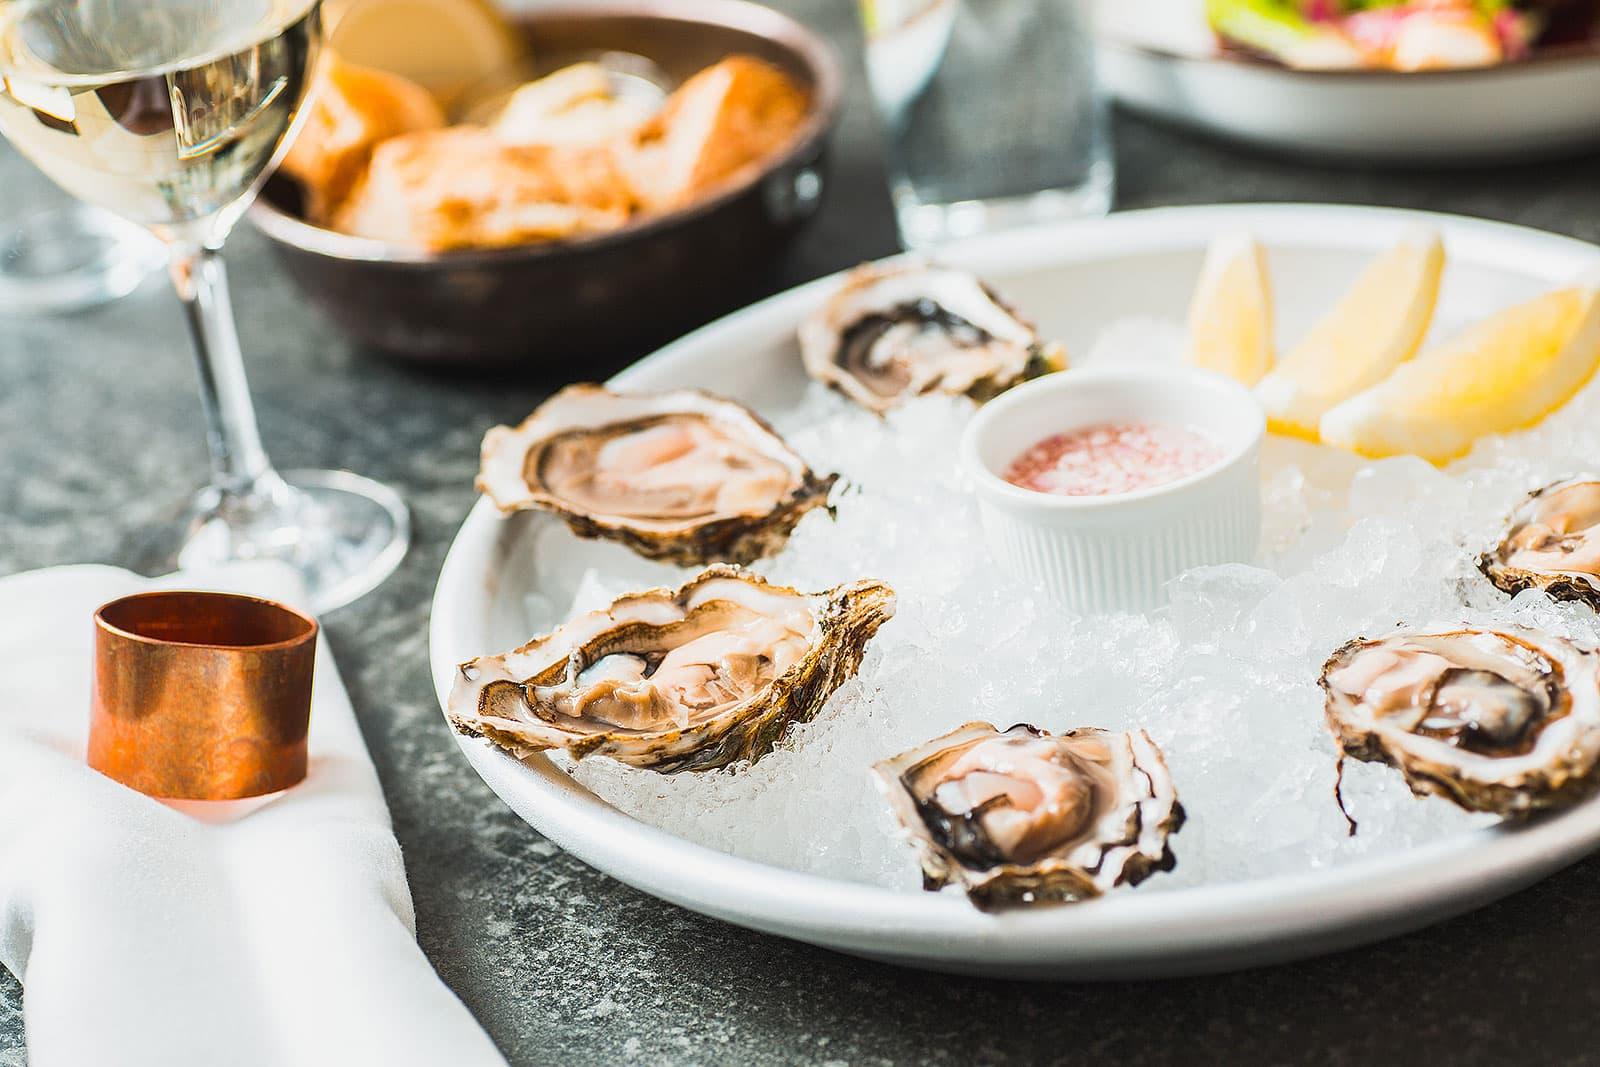 Svenska ostron kan bli fransk lyx 2